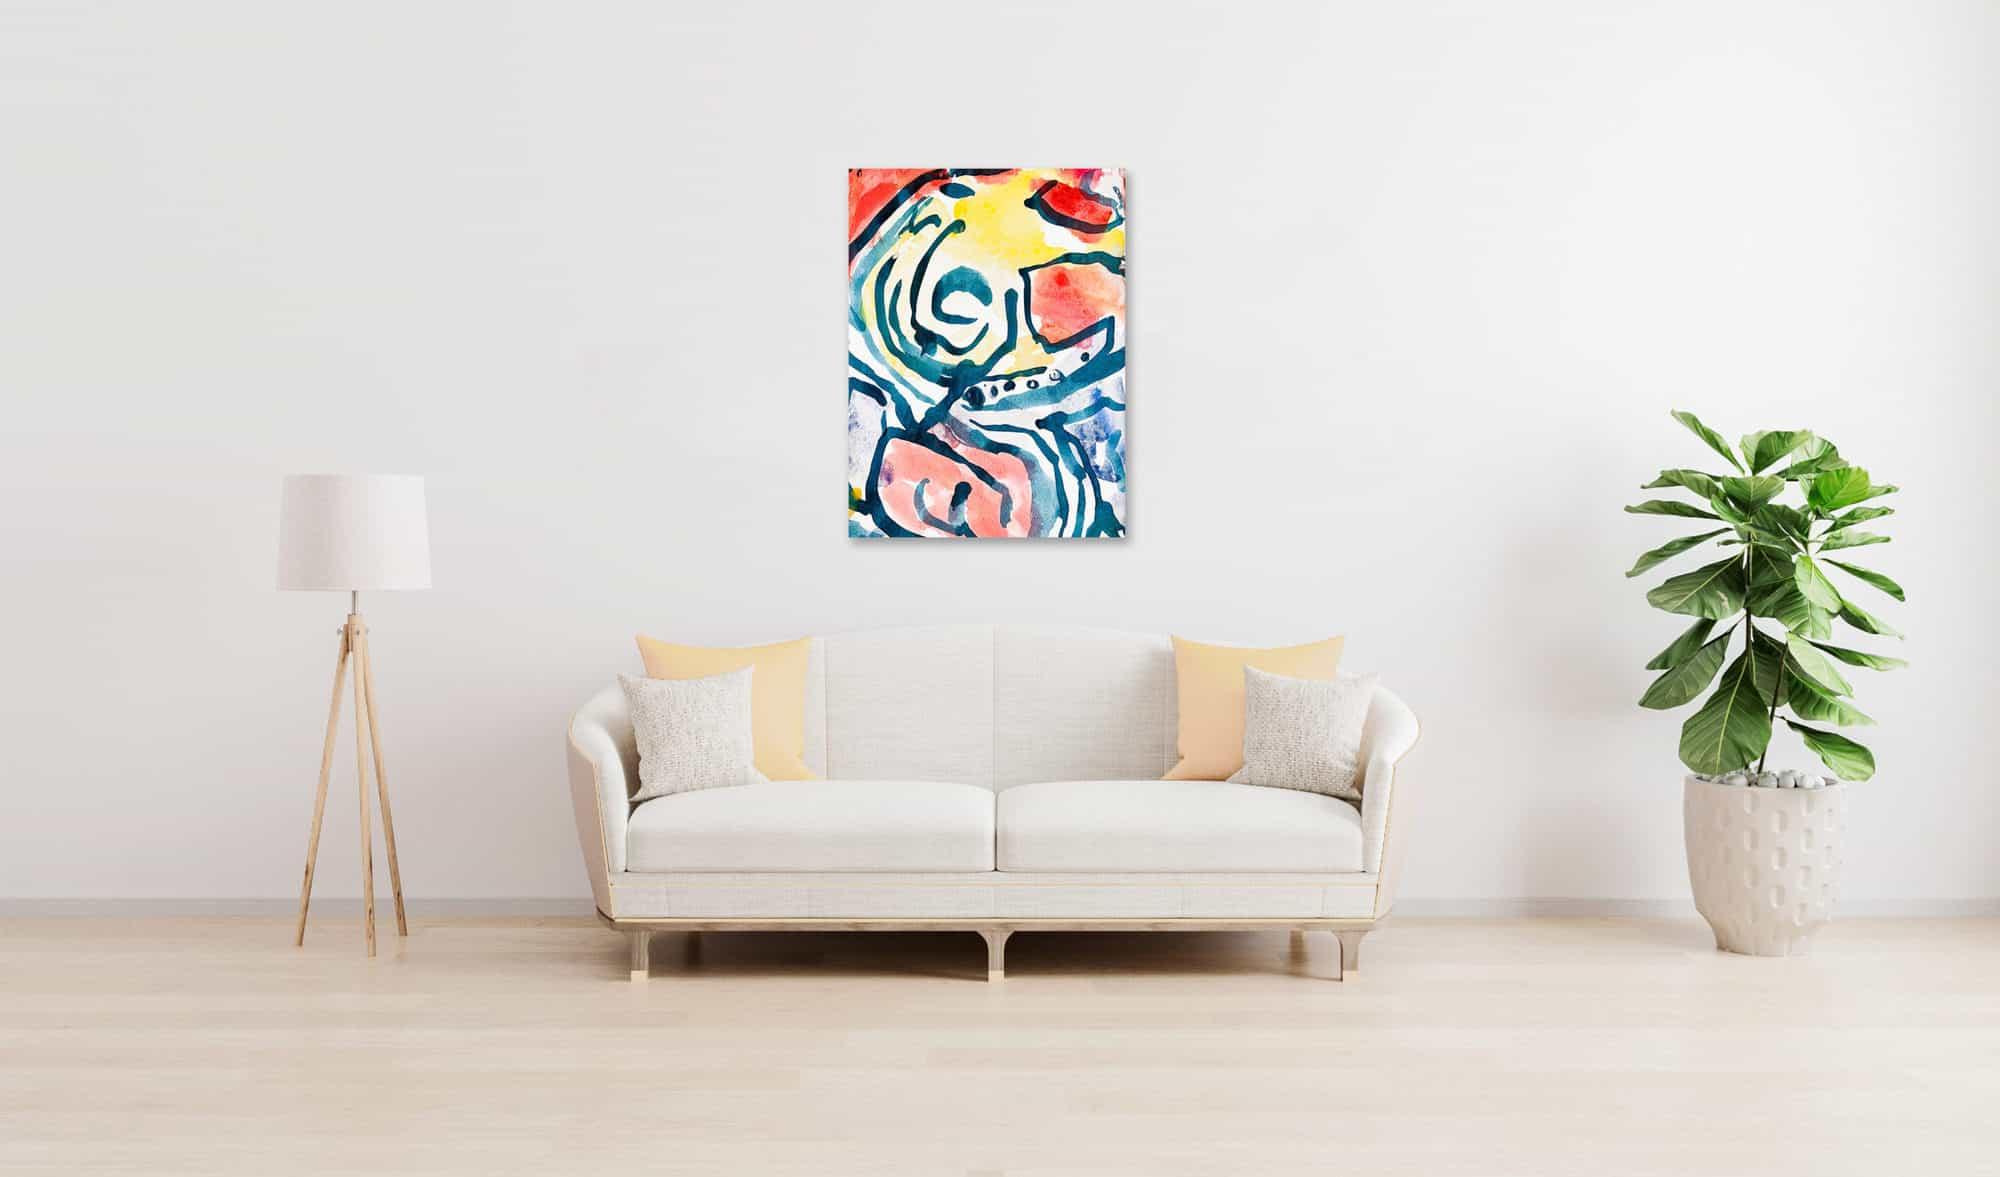 Abstraktes Acrylbild Gelb Rote Abstraktion mit Blau wandbild